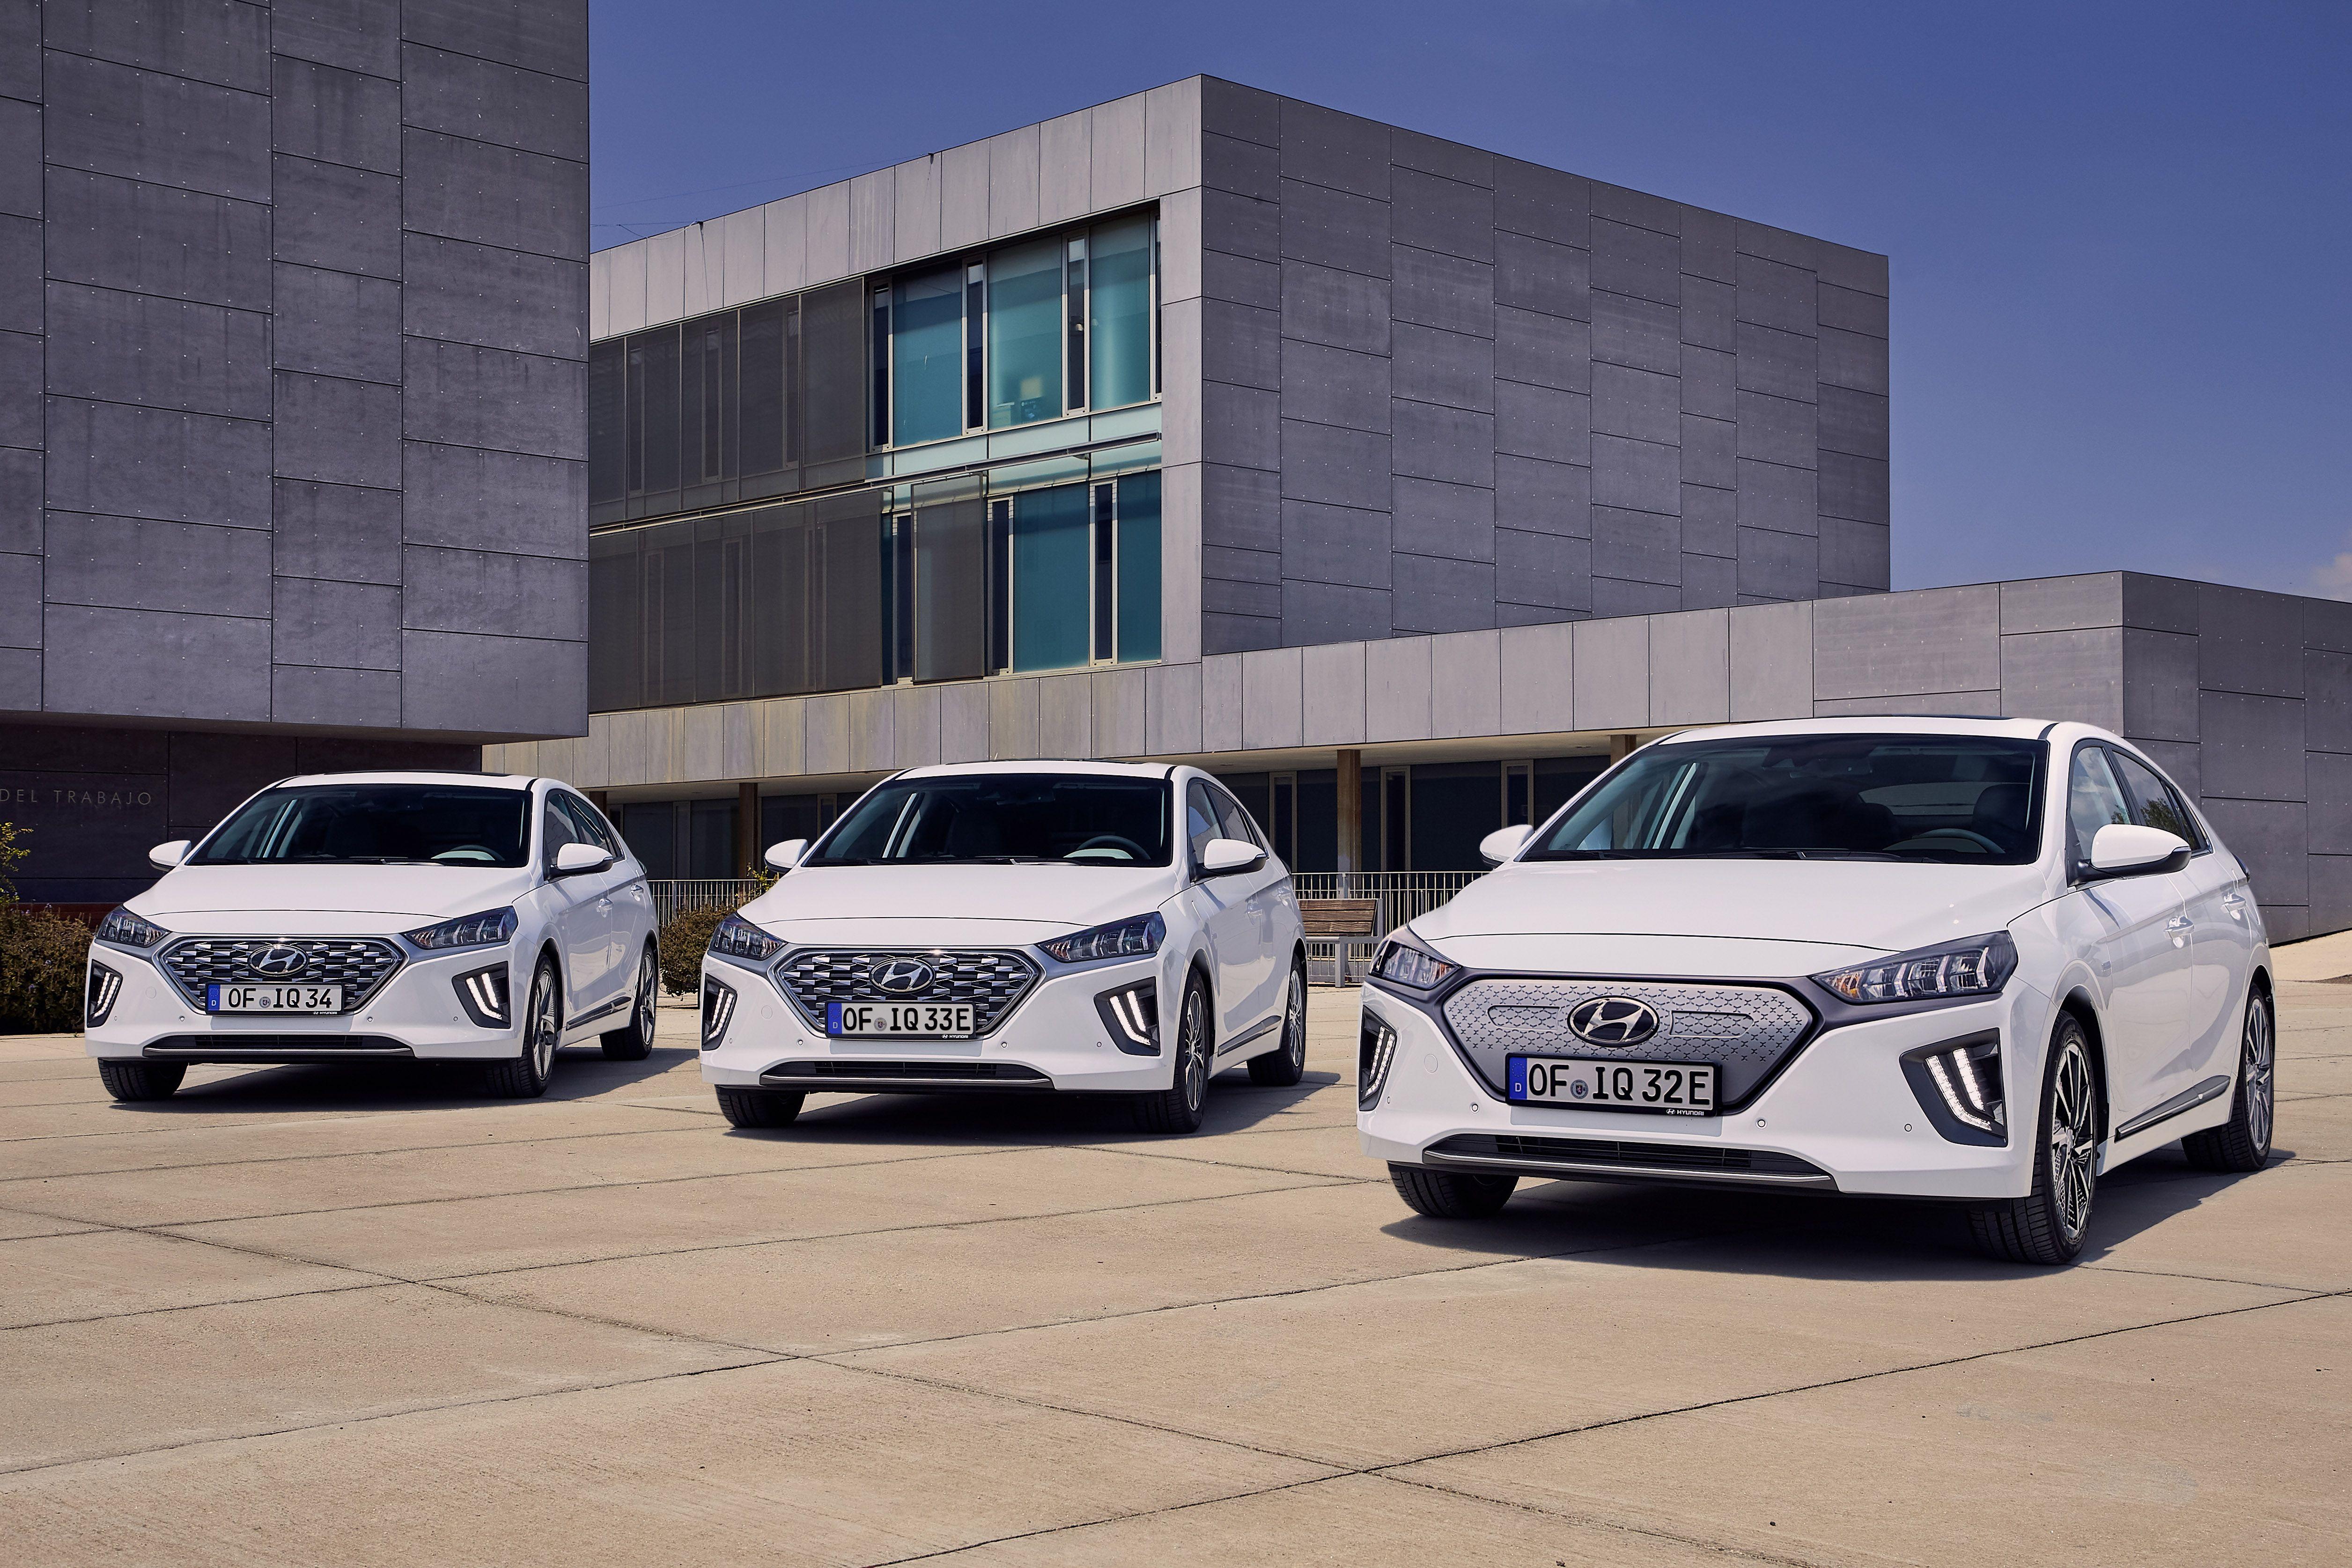 2020 Hyundai Ioniq Hybrid - New Styling, Big New Screen, Bigger Battery